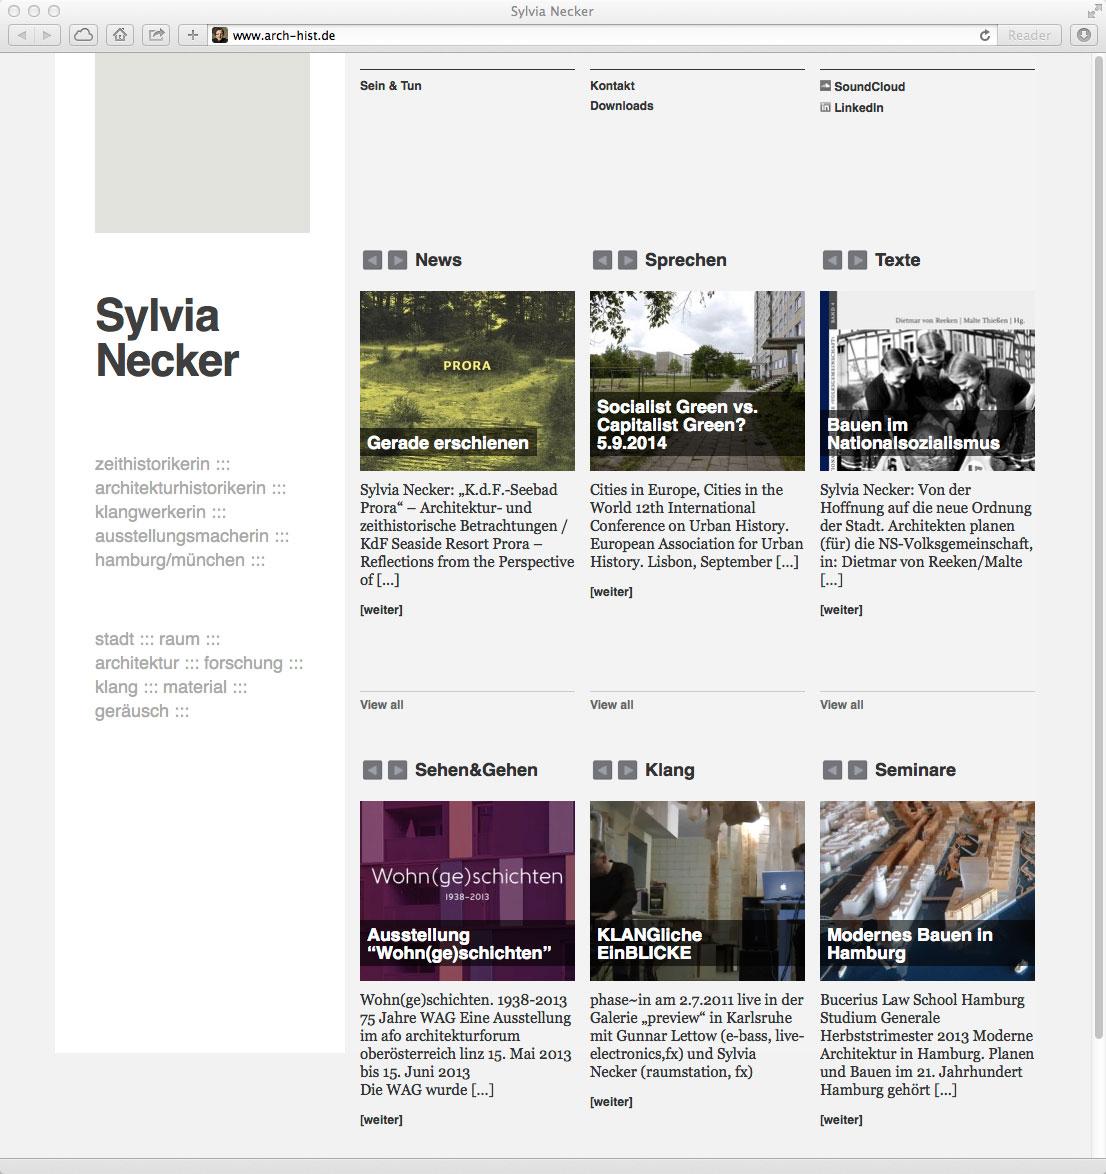 sylvia-necker_arch-hist_start_